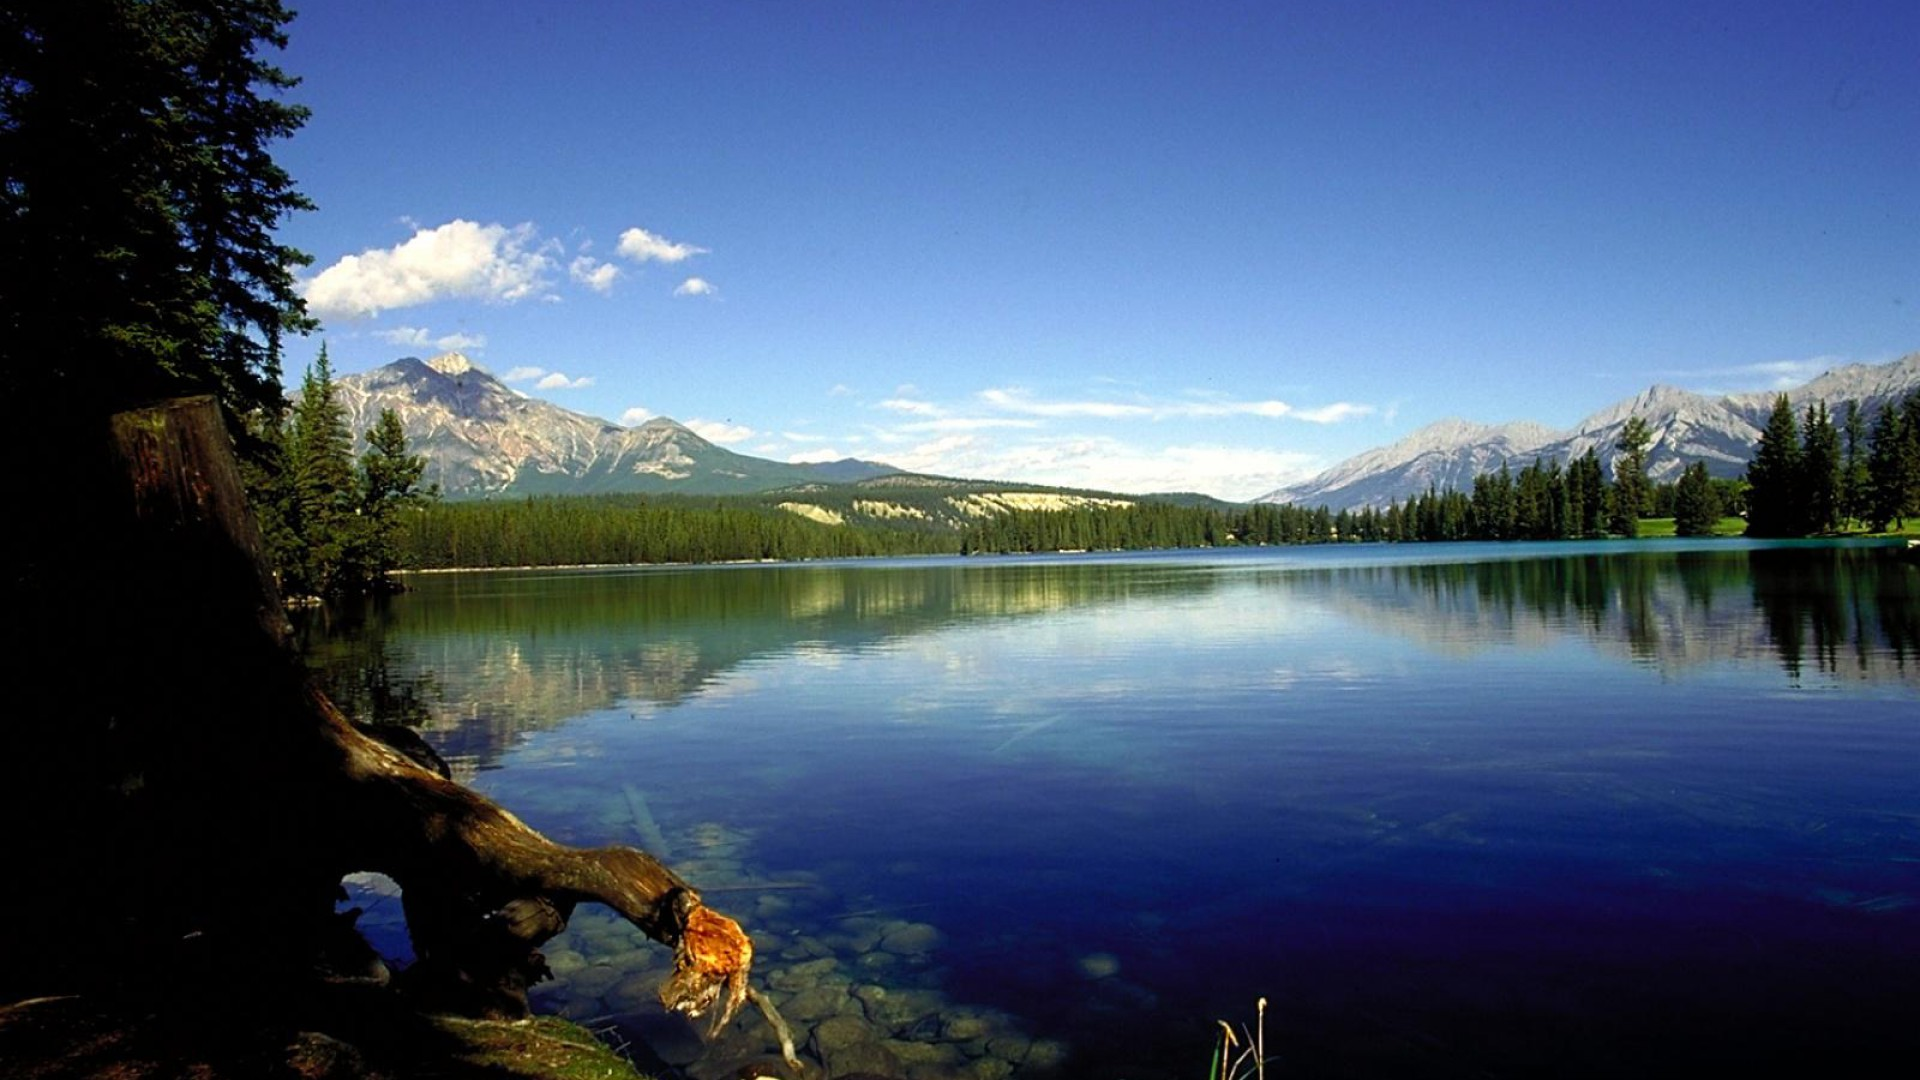 Bing Fall Desktop Wallpaper Lake Wallpaper 1920x1080 43187